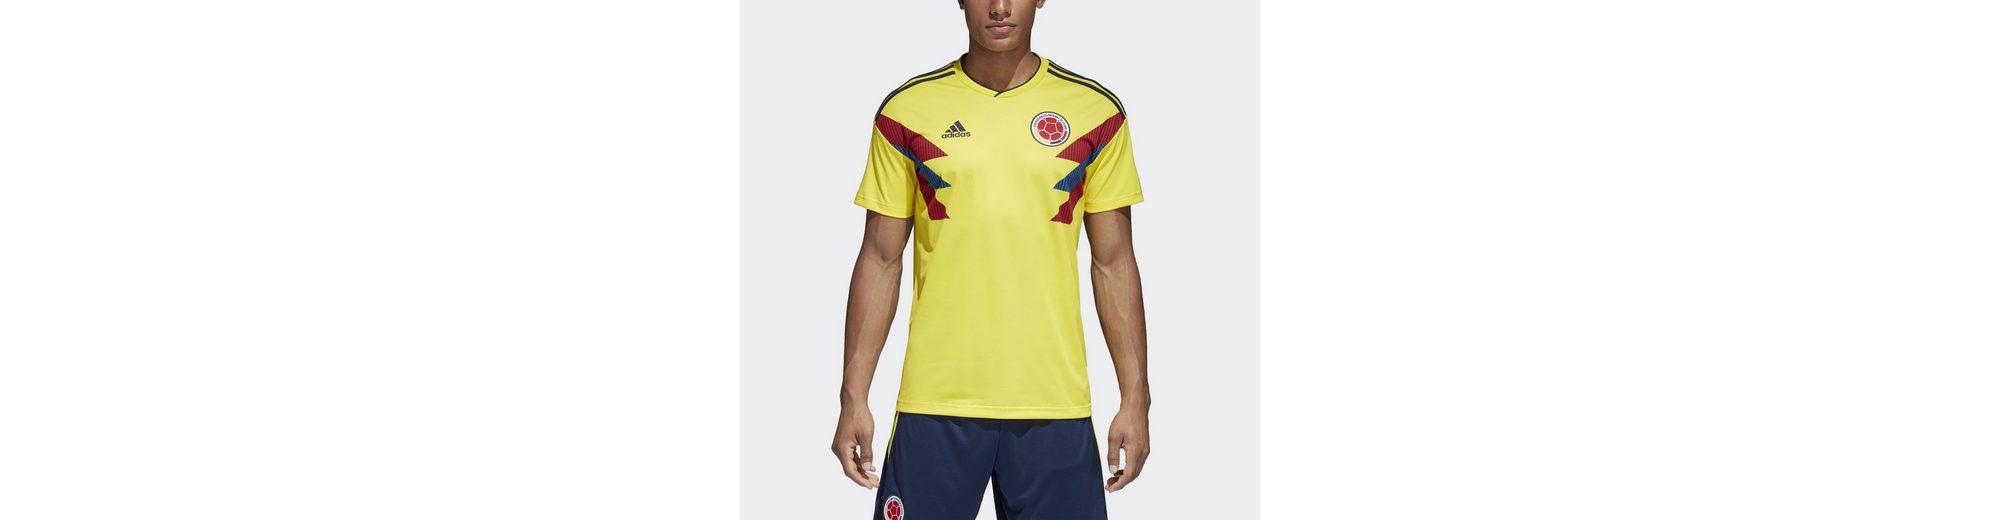 Online-Verkauf adidas Performance Footballtrikot Kolumbien Heimtrikot Replica Offizielle Seite Online Zum Verkauf Preiswerten Realen Spielraum Finden Große Perfekt QW9Kq